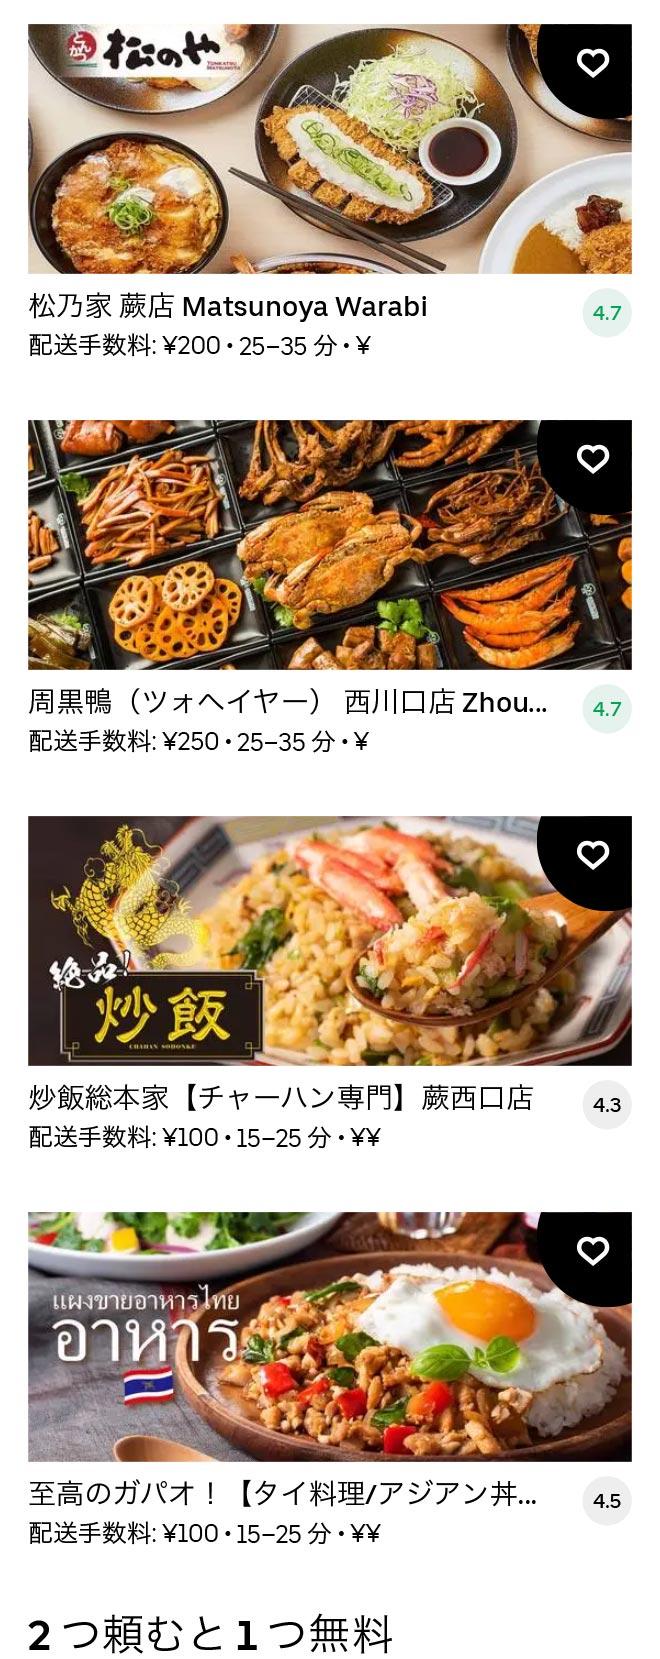 Warabi menu 2011 06